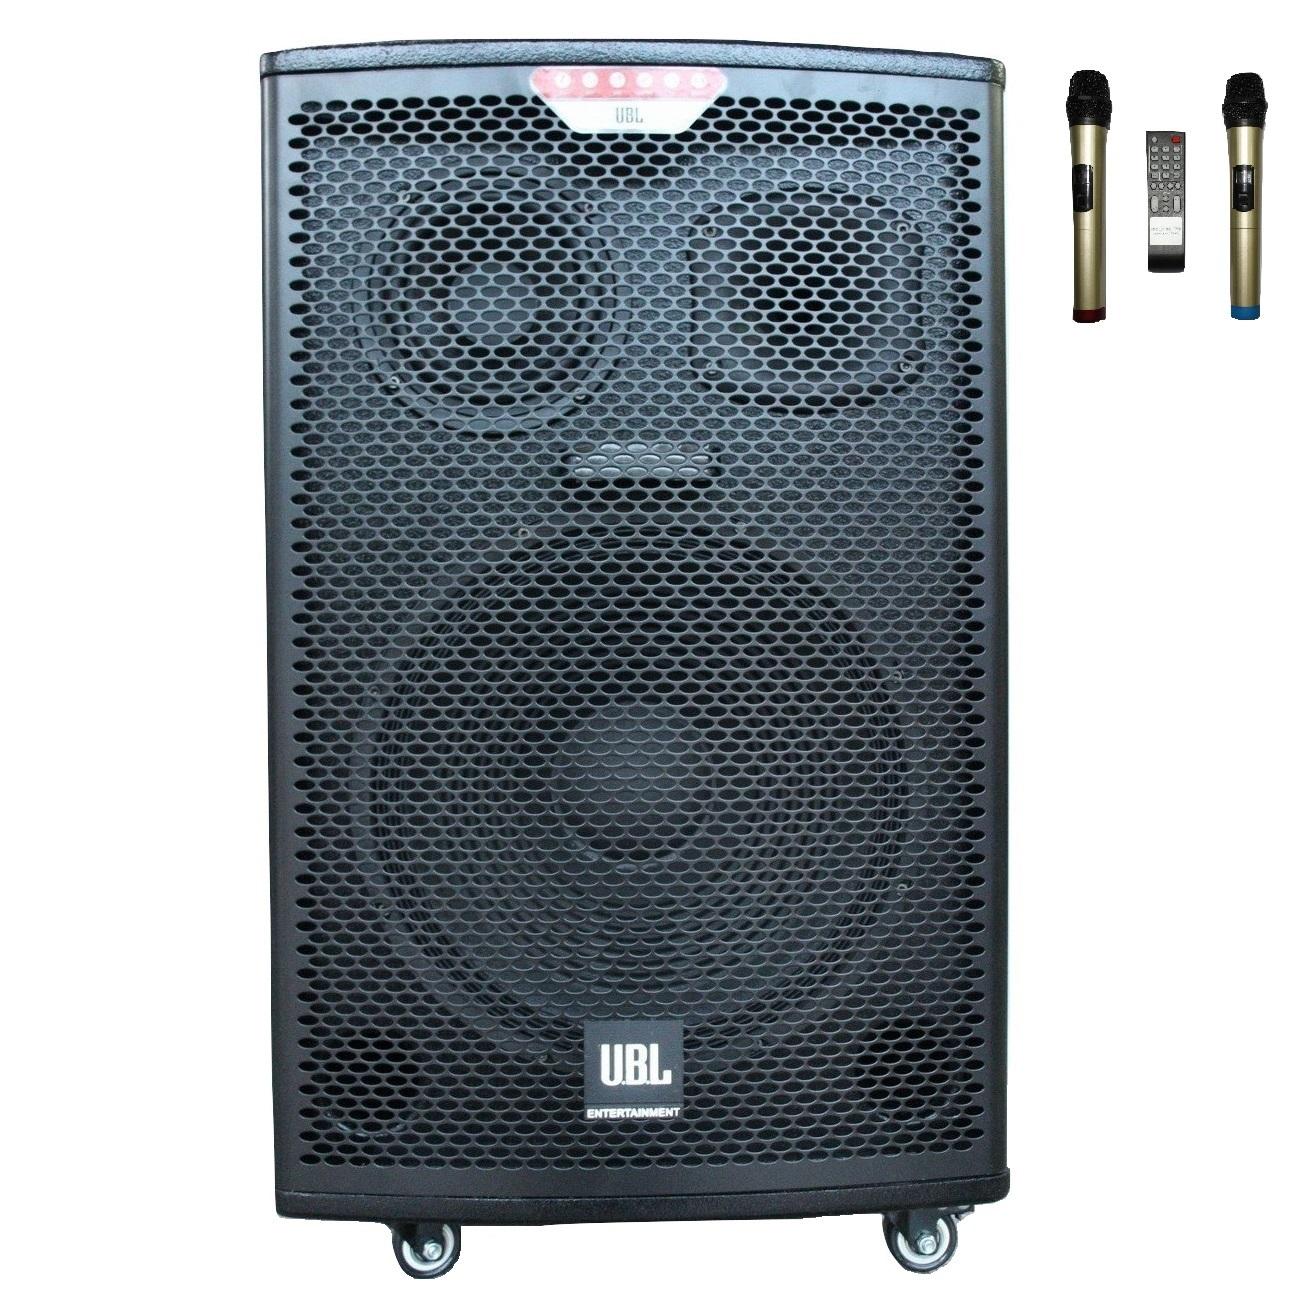 Loa Kéo Di Động Karaoke Bass 30 U.B.L LK-30U60 (600W) 3 Tấc - Chính Hãng